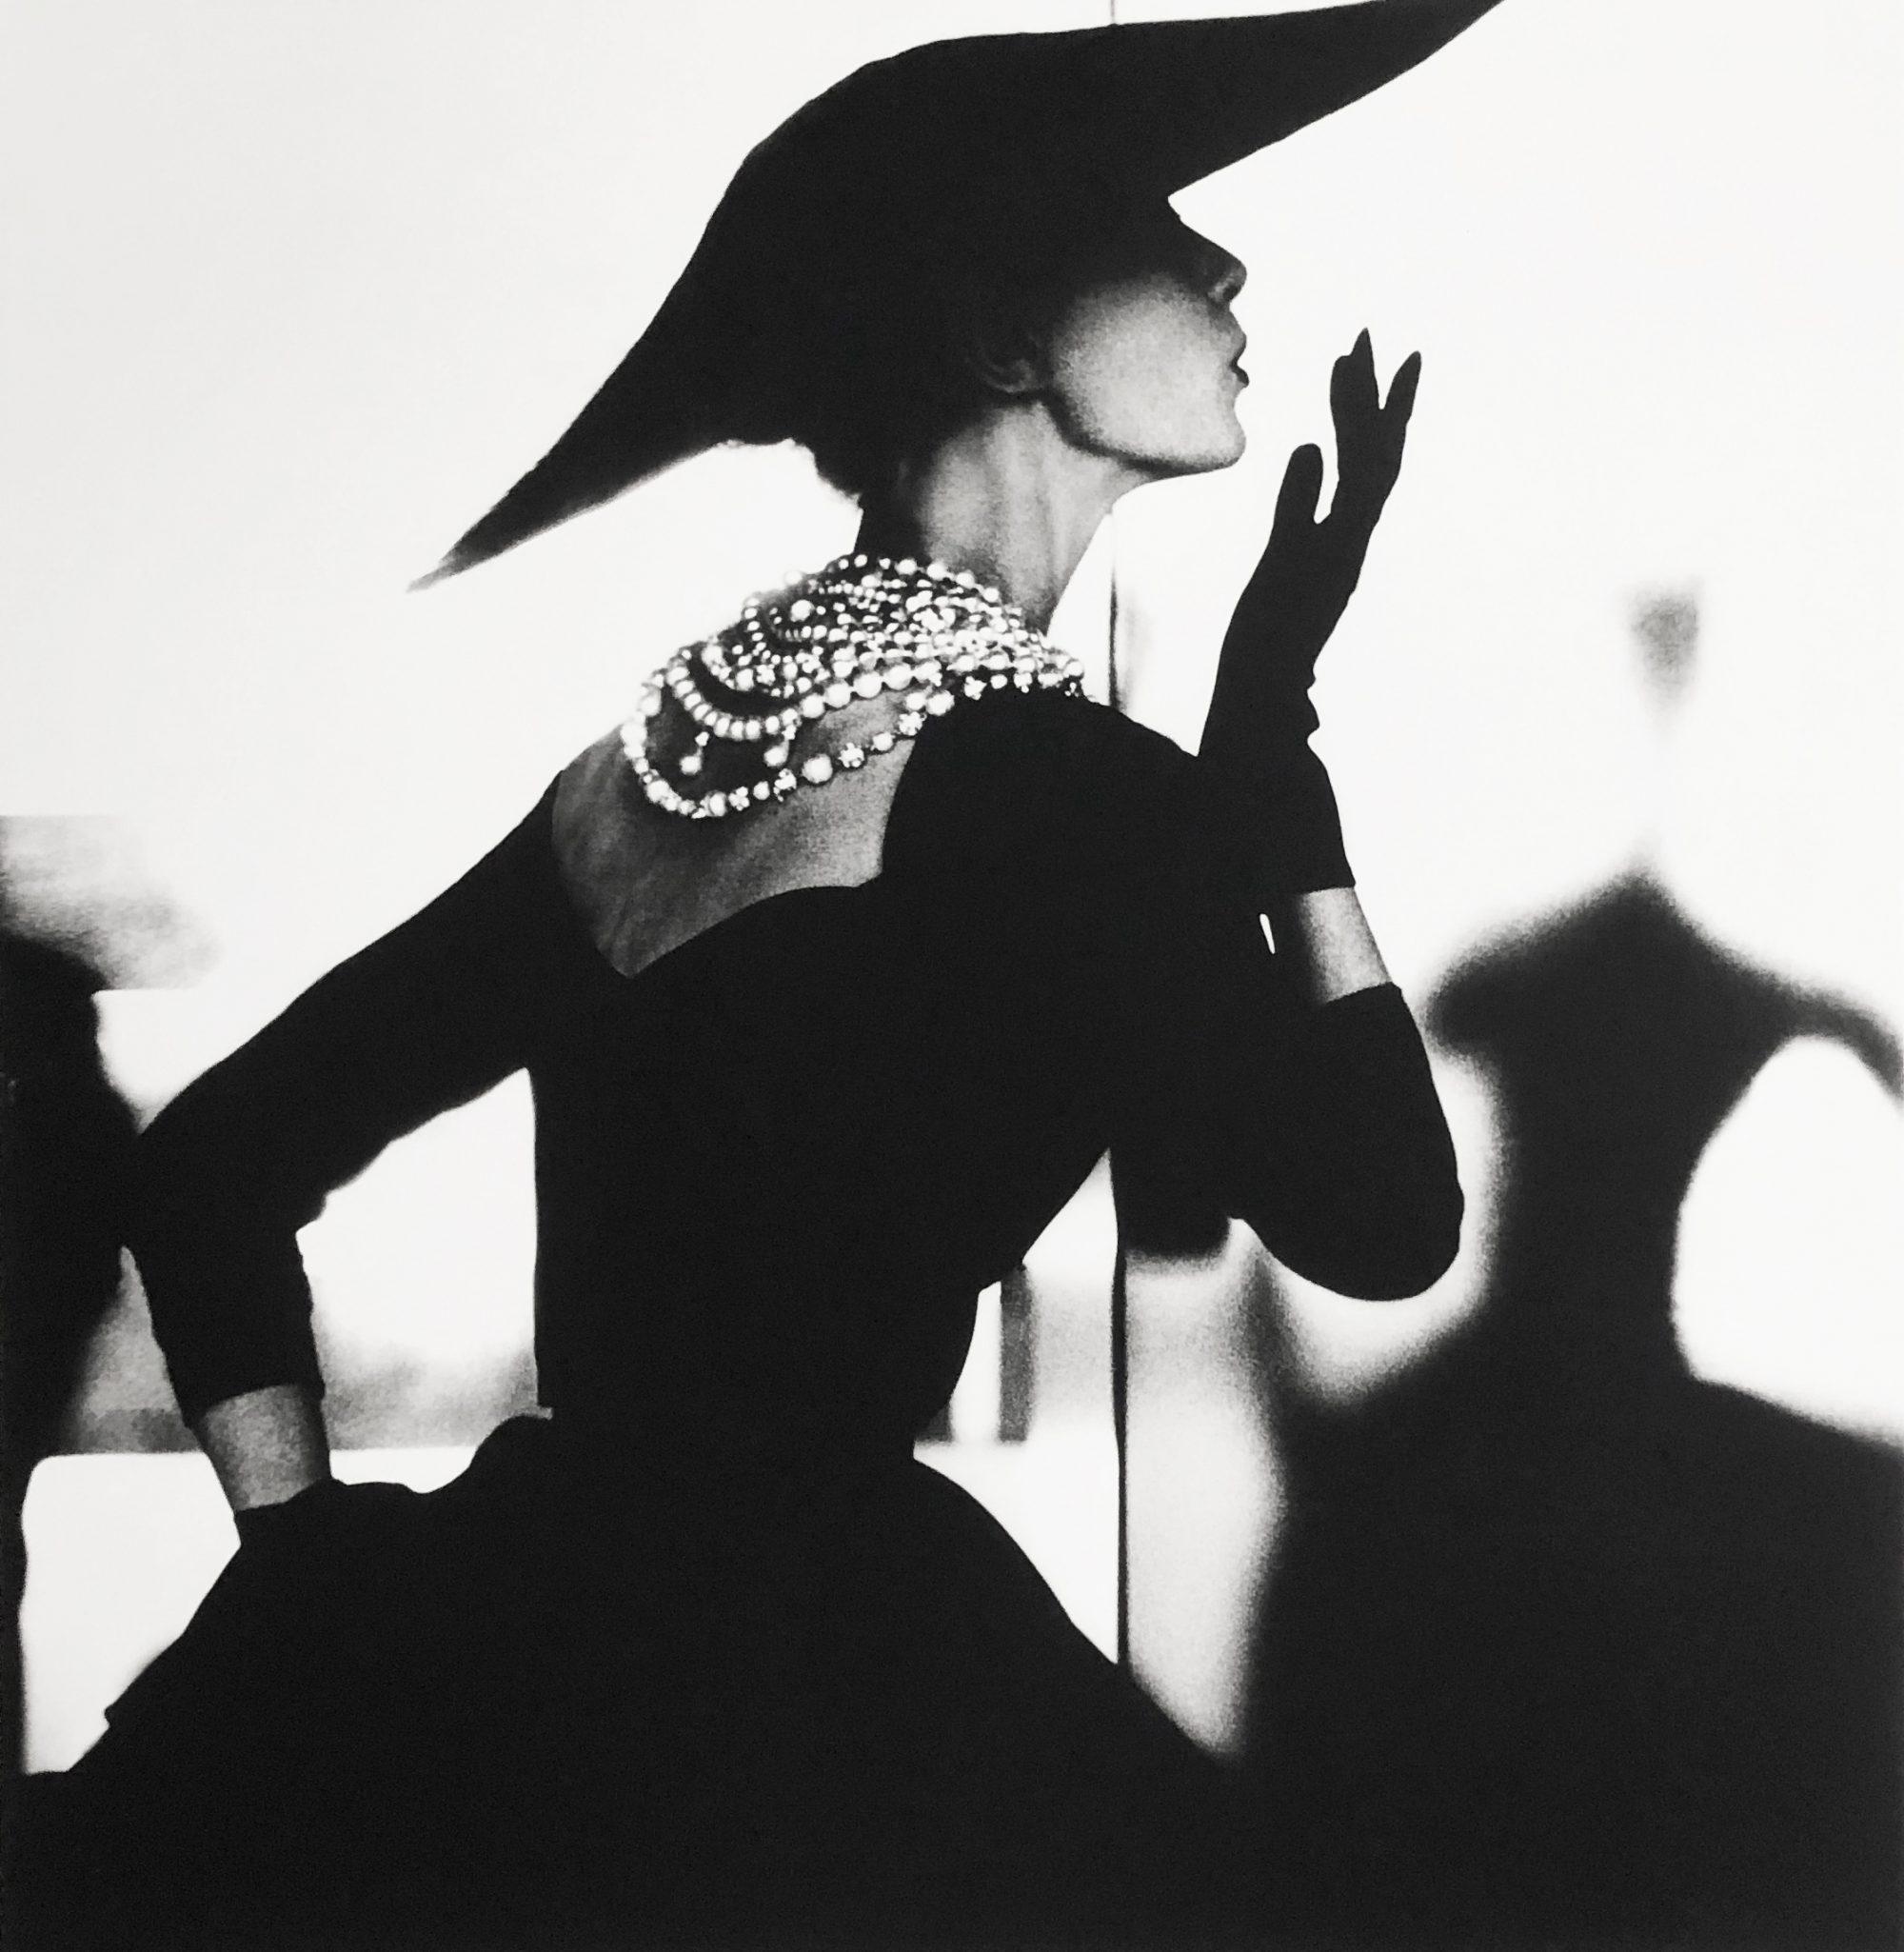 Fotó: Lillian Bassman: Blowing Kiss, Barbara Mullen, New York, c. 1958